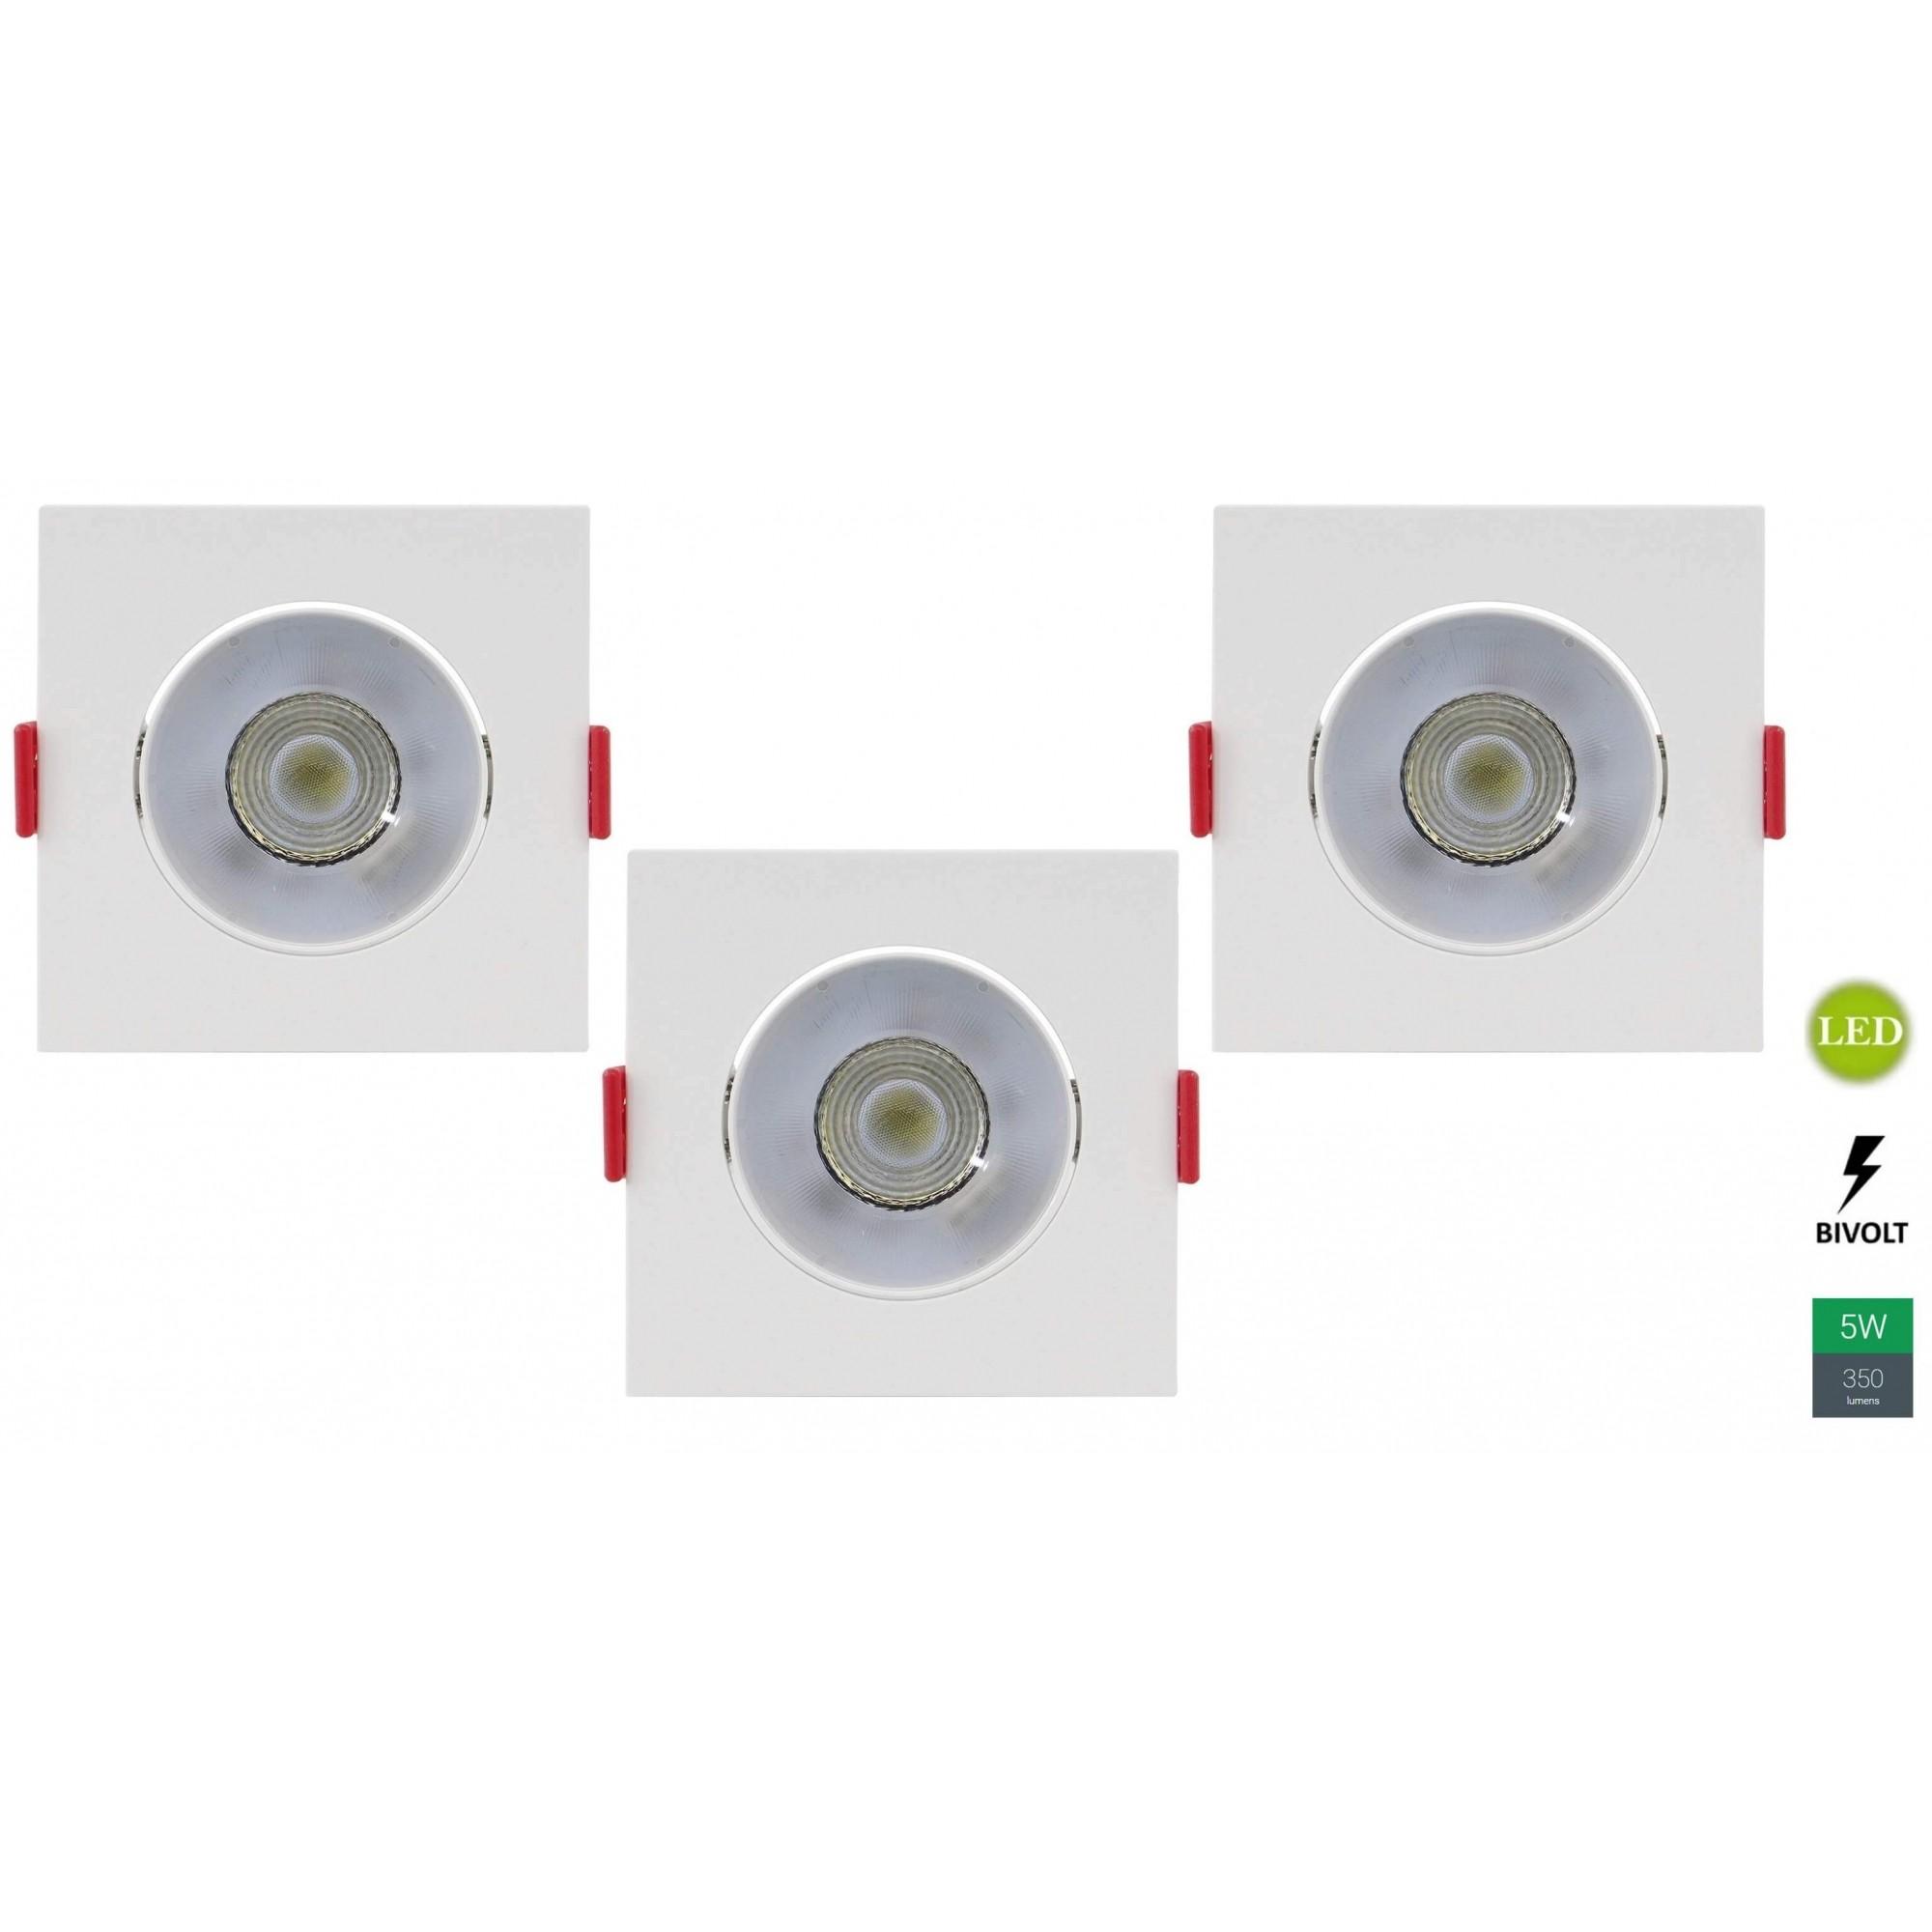 Kit 3 Spots Embutir 5w Quadrado Branco Quente